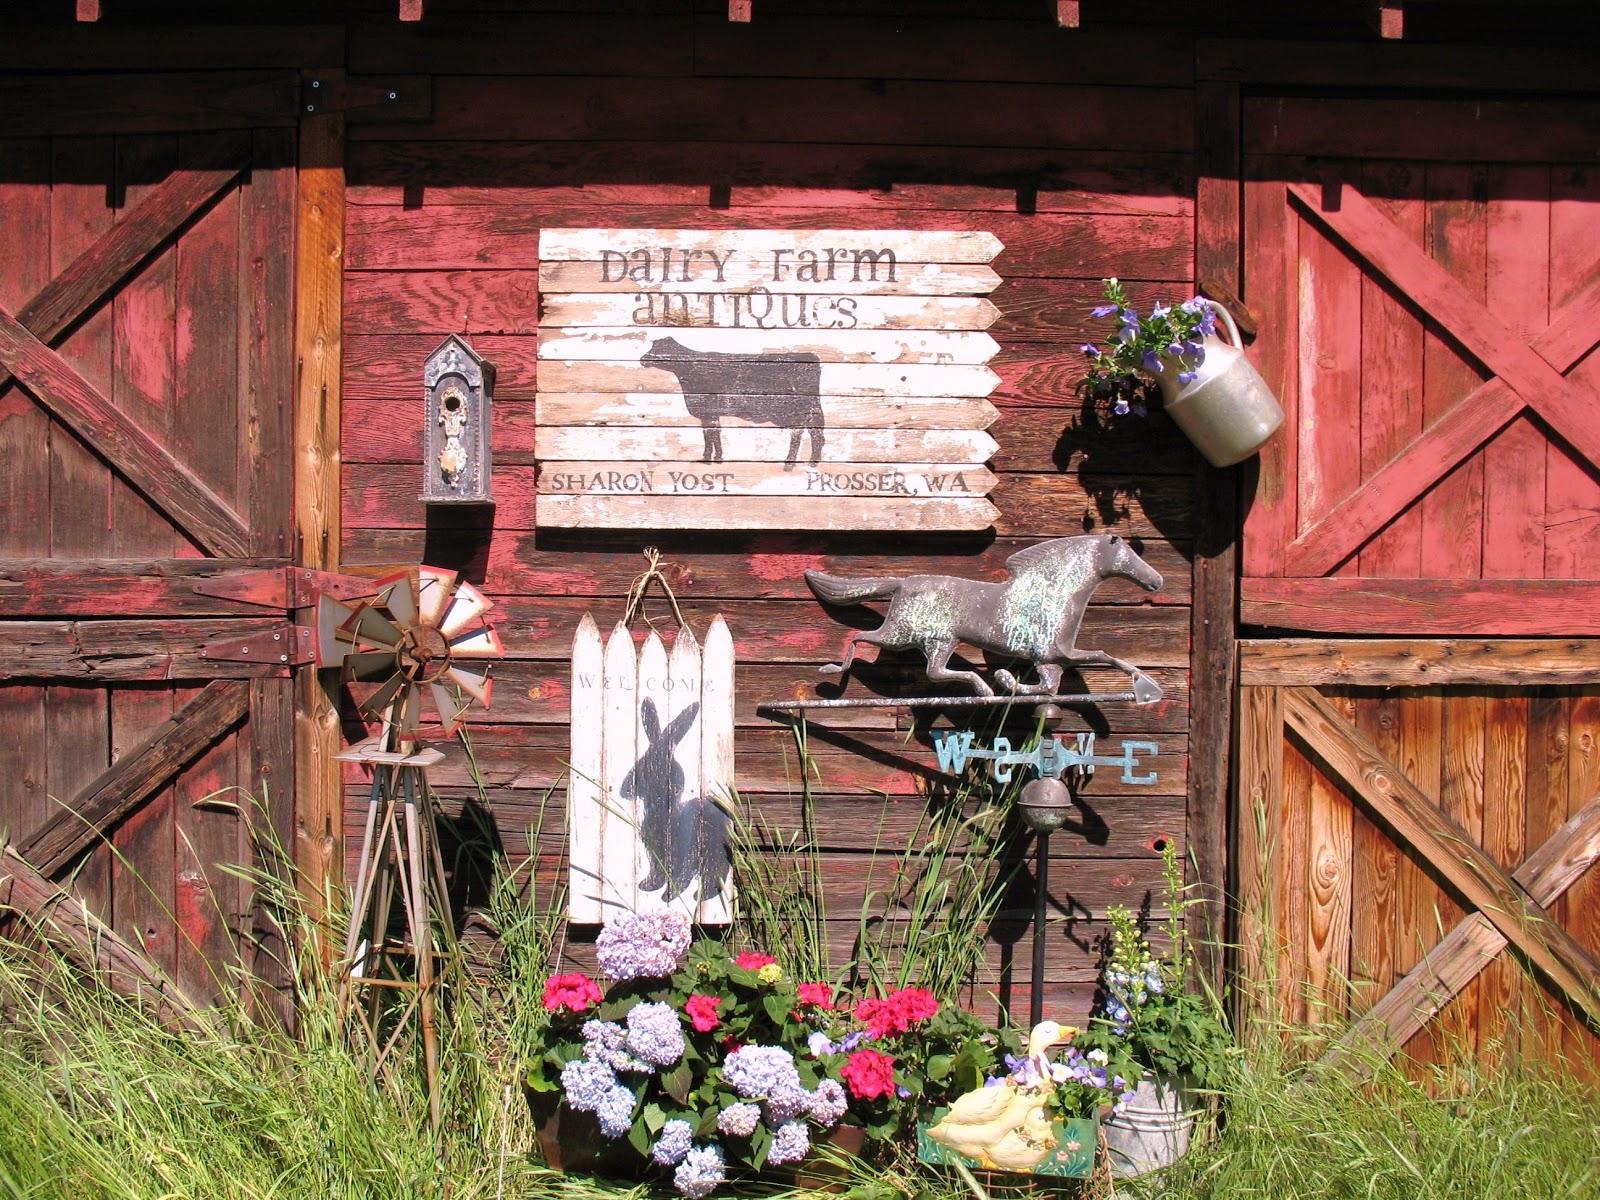 Dairy Farm Antiques Quality Farm Items Decor Furniture